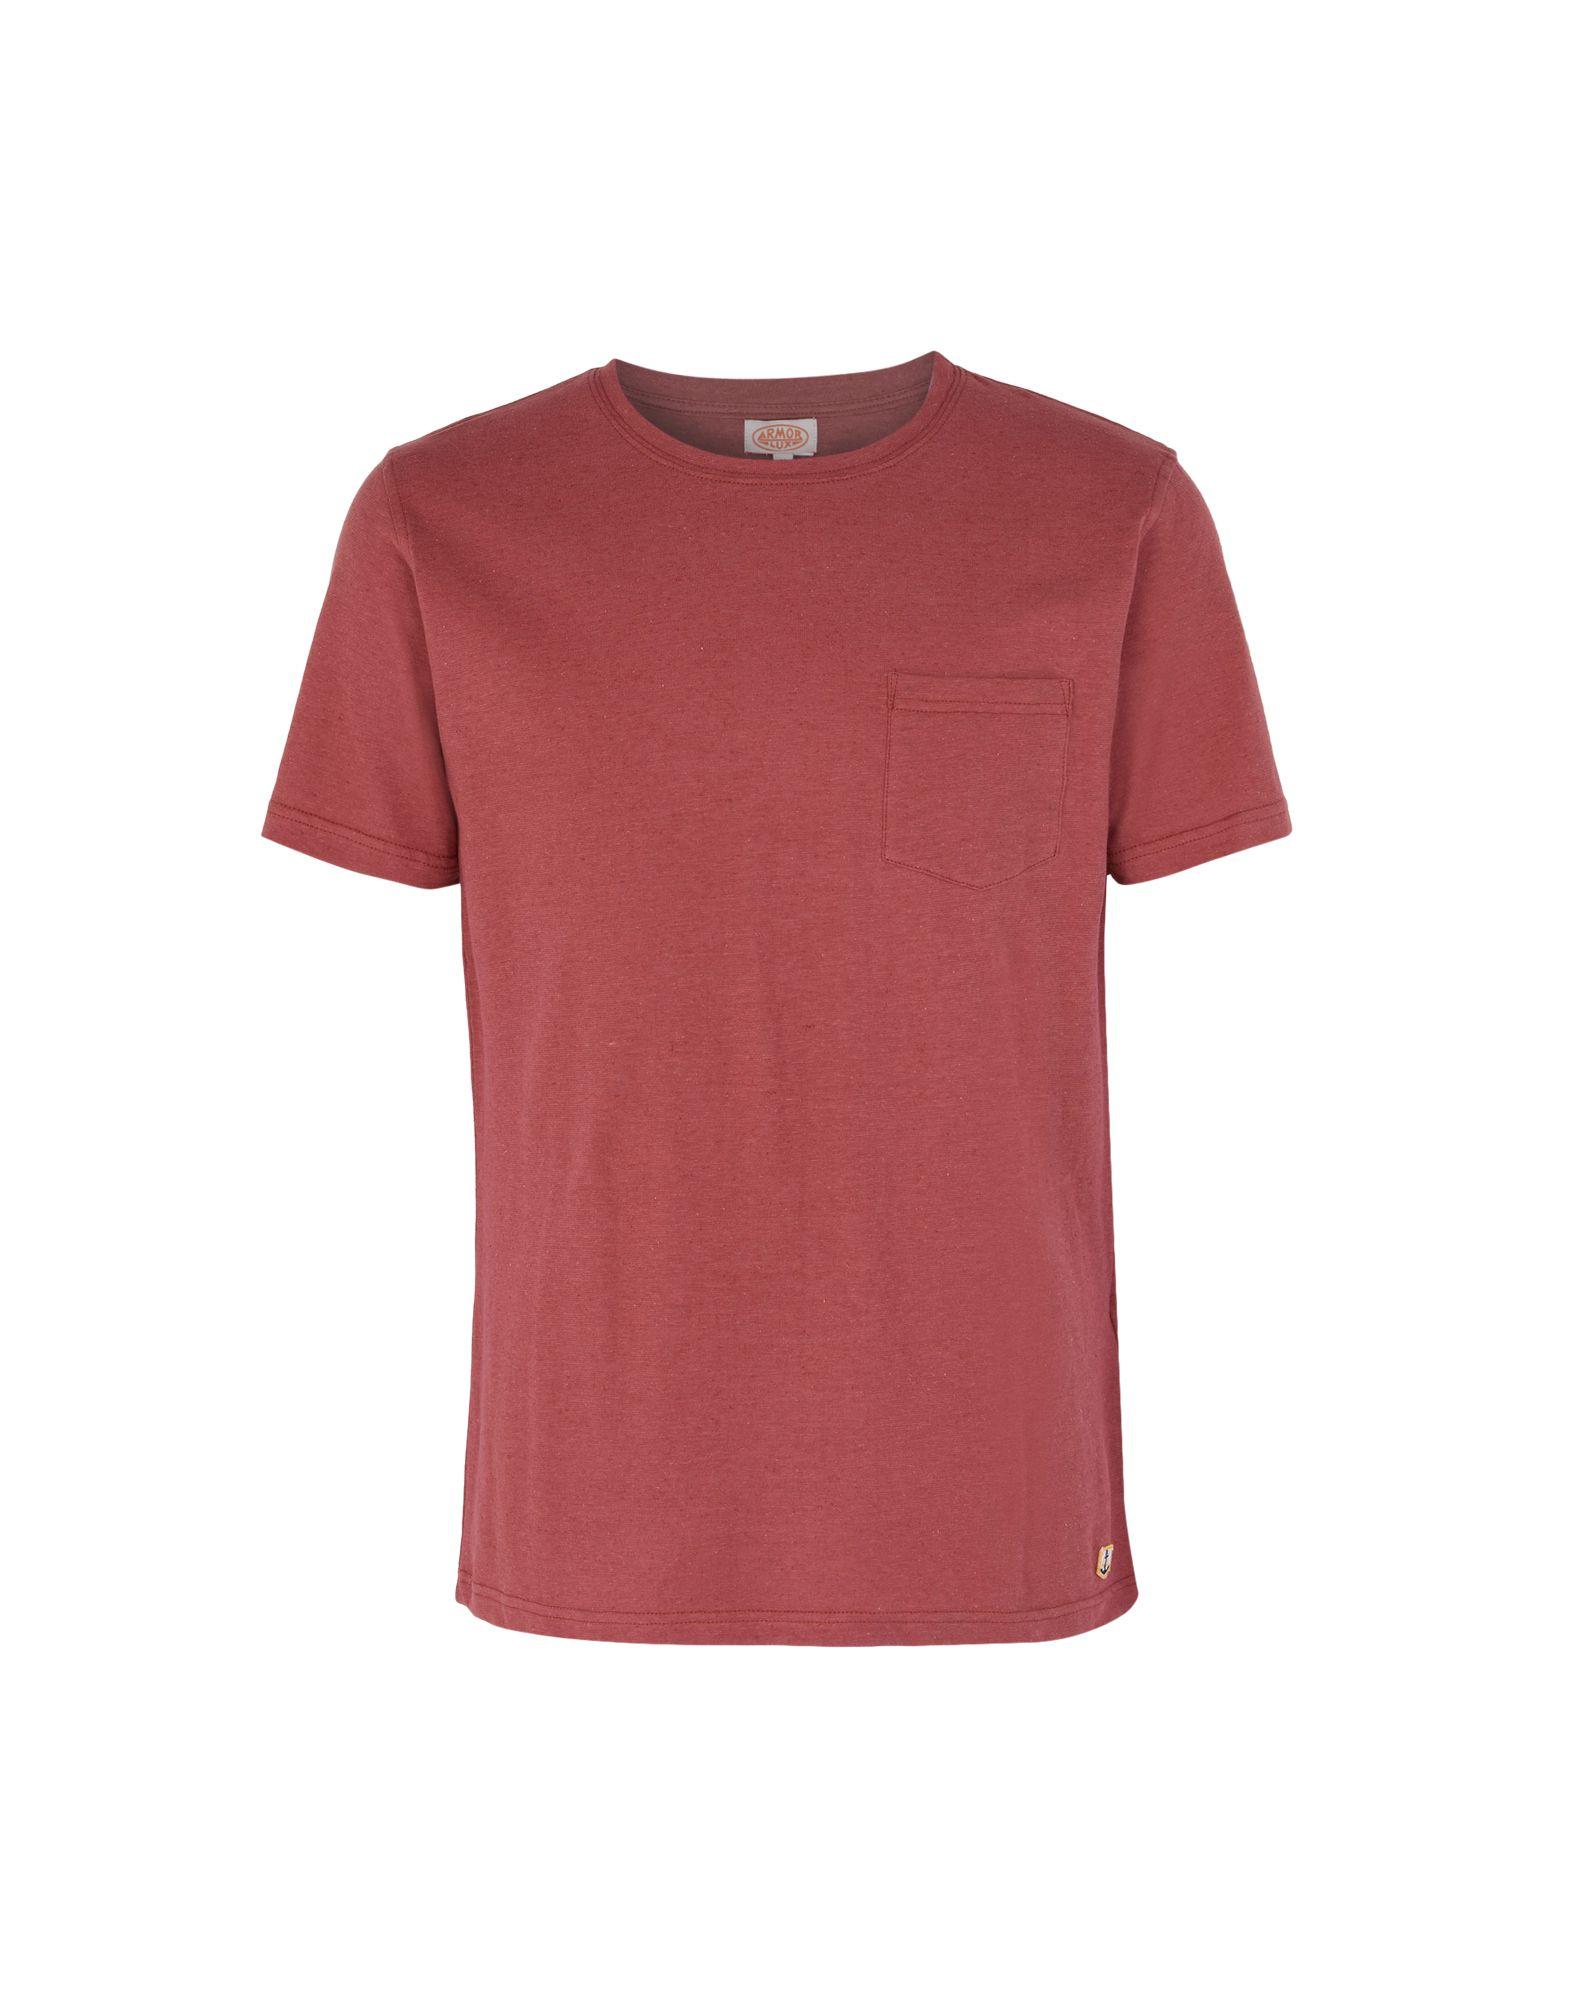 T-Shirt Armor-Lux T-Shirt Mc Heritage Heritage Mc - Uomo - 12167451JF 23aaba